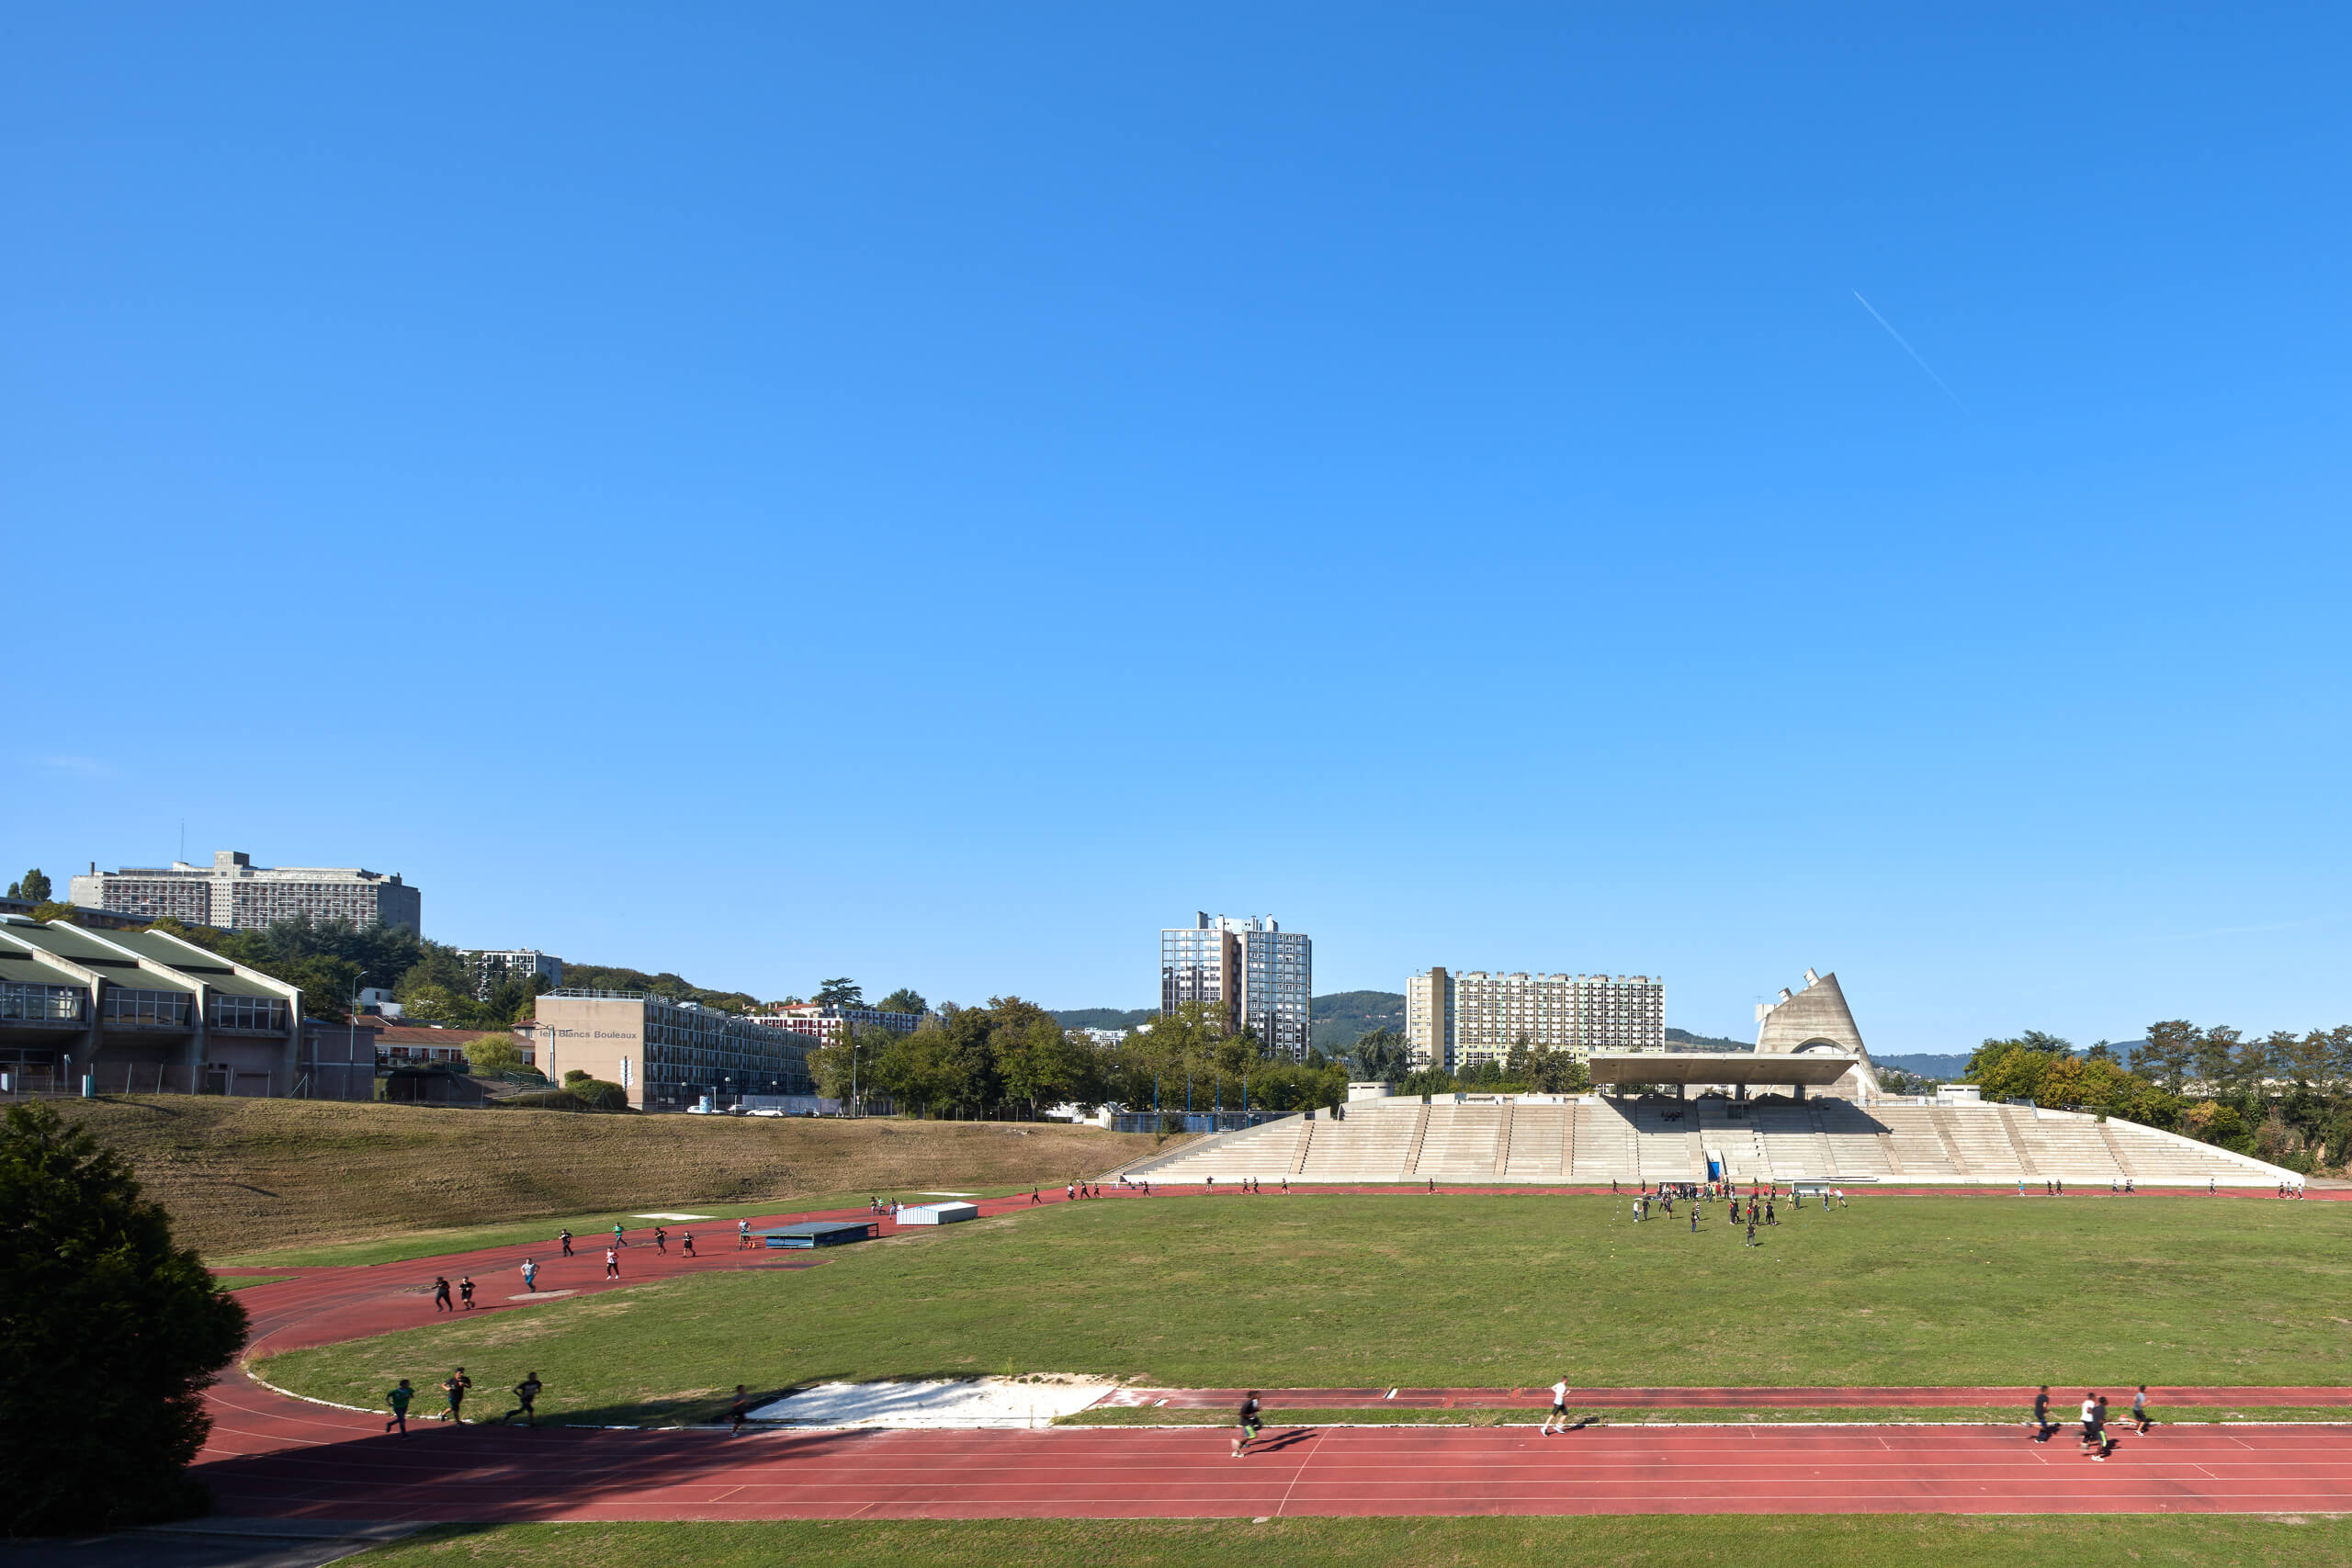 Federico_Covre_Le_Corbusier_Stadium_Firminy_2018_31_01